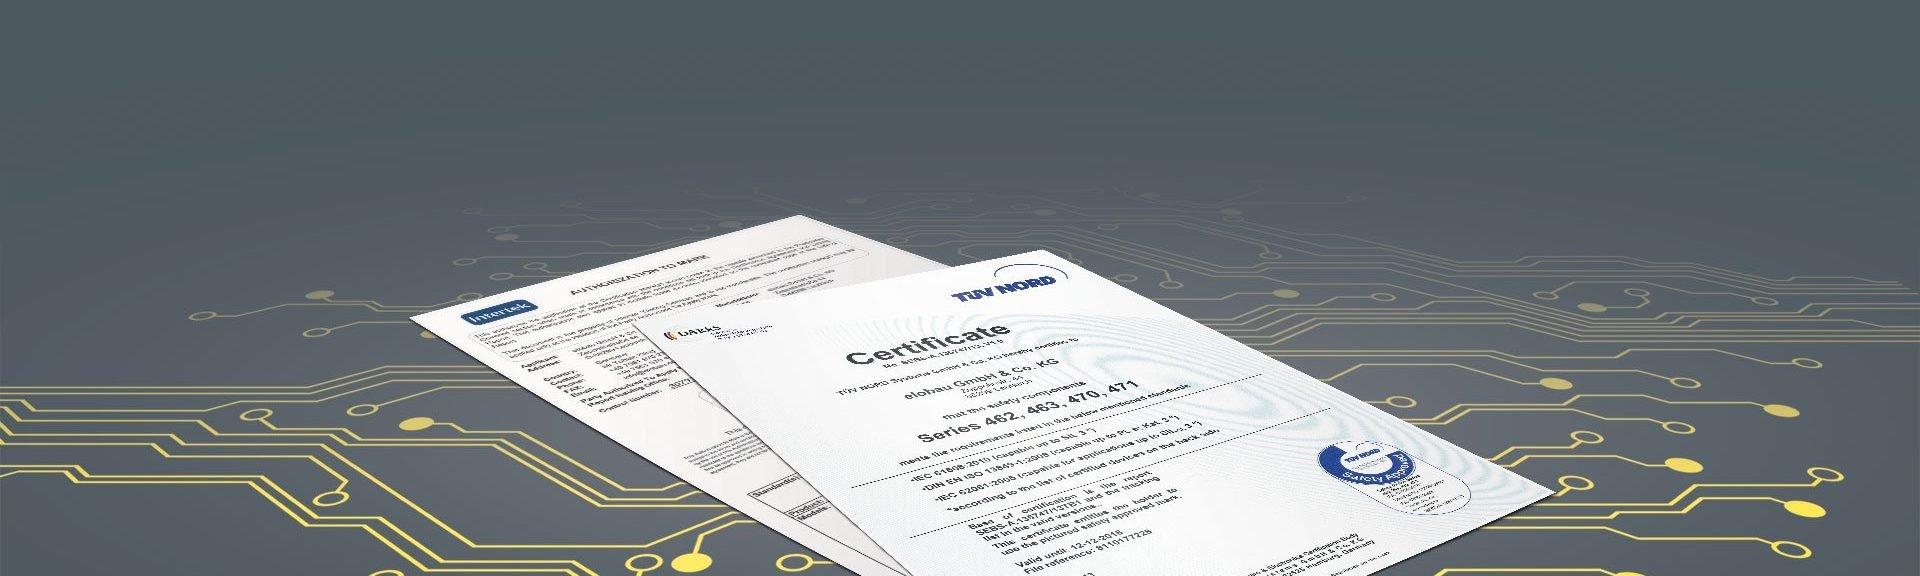 Zertifikate-MS-1920×1080-RZ-06022018